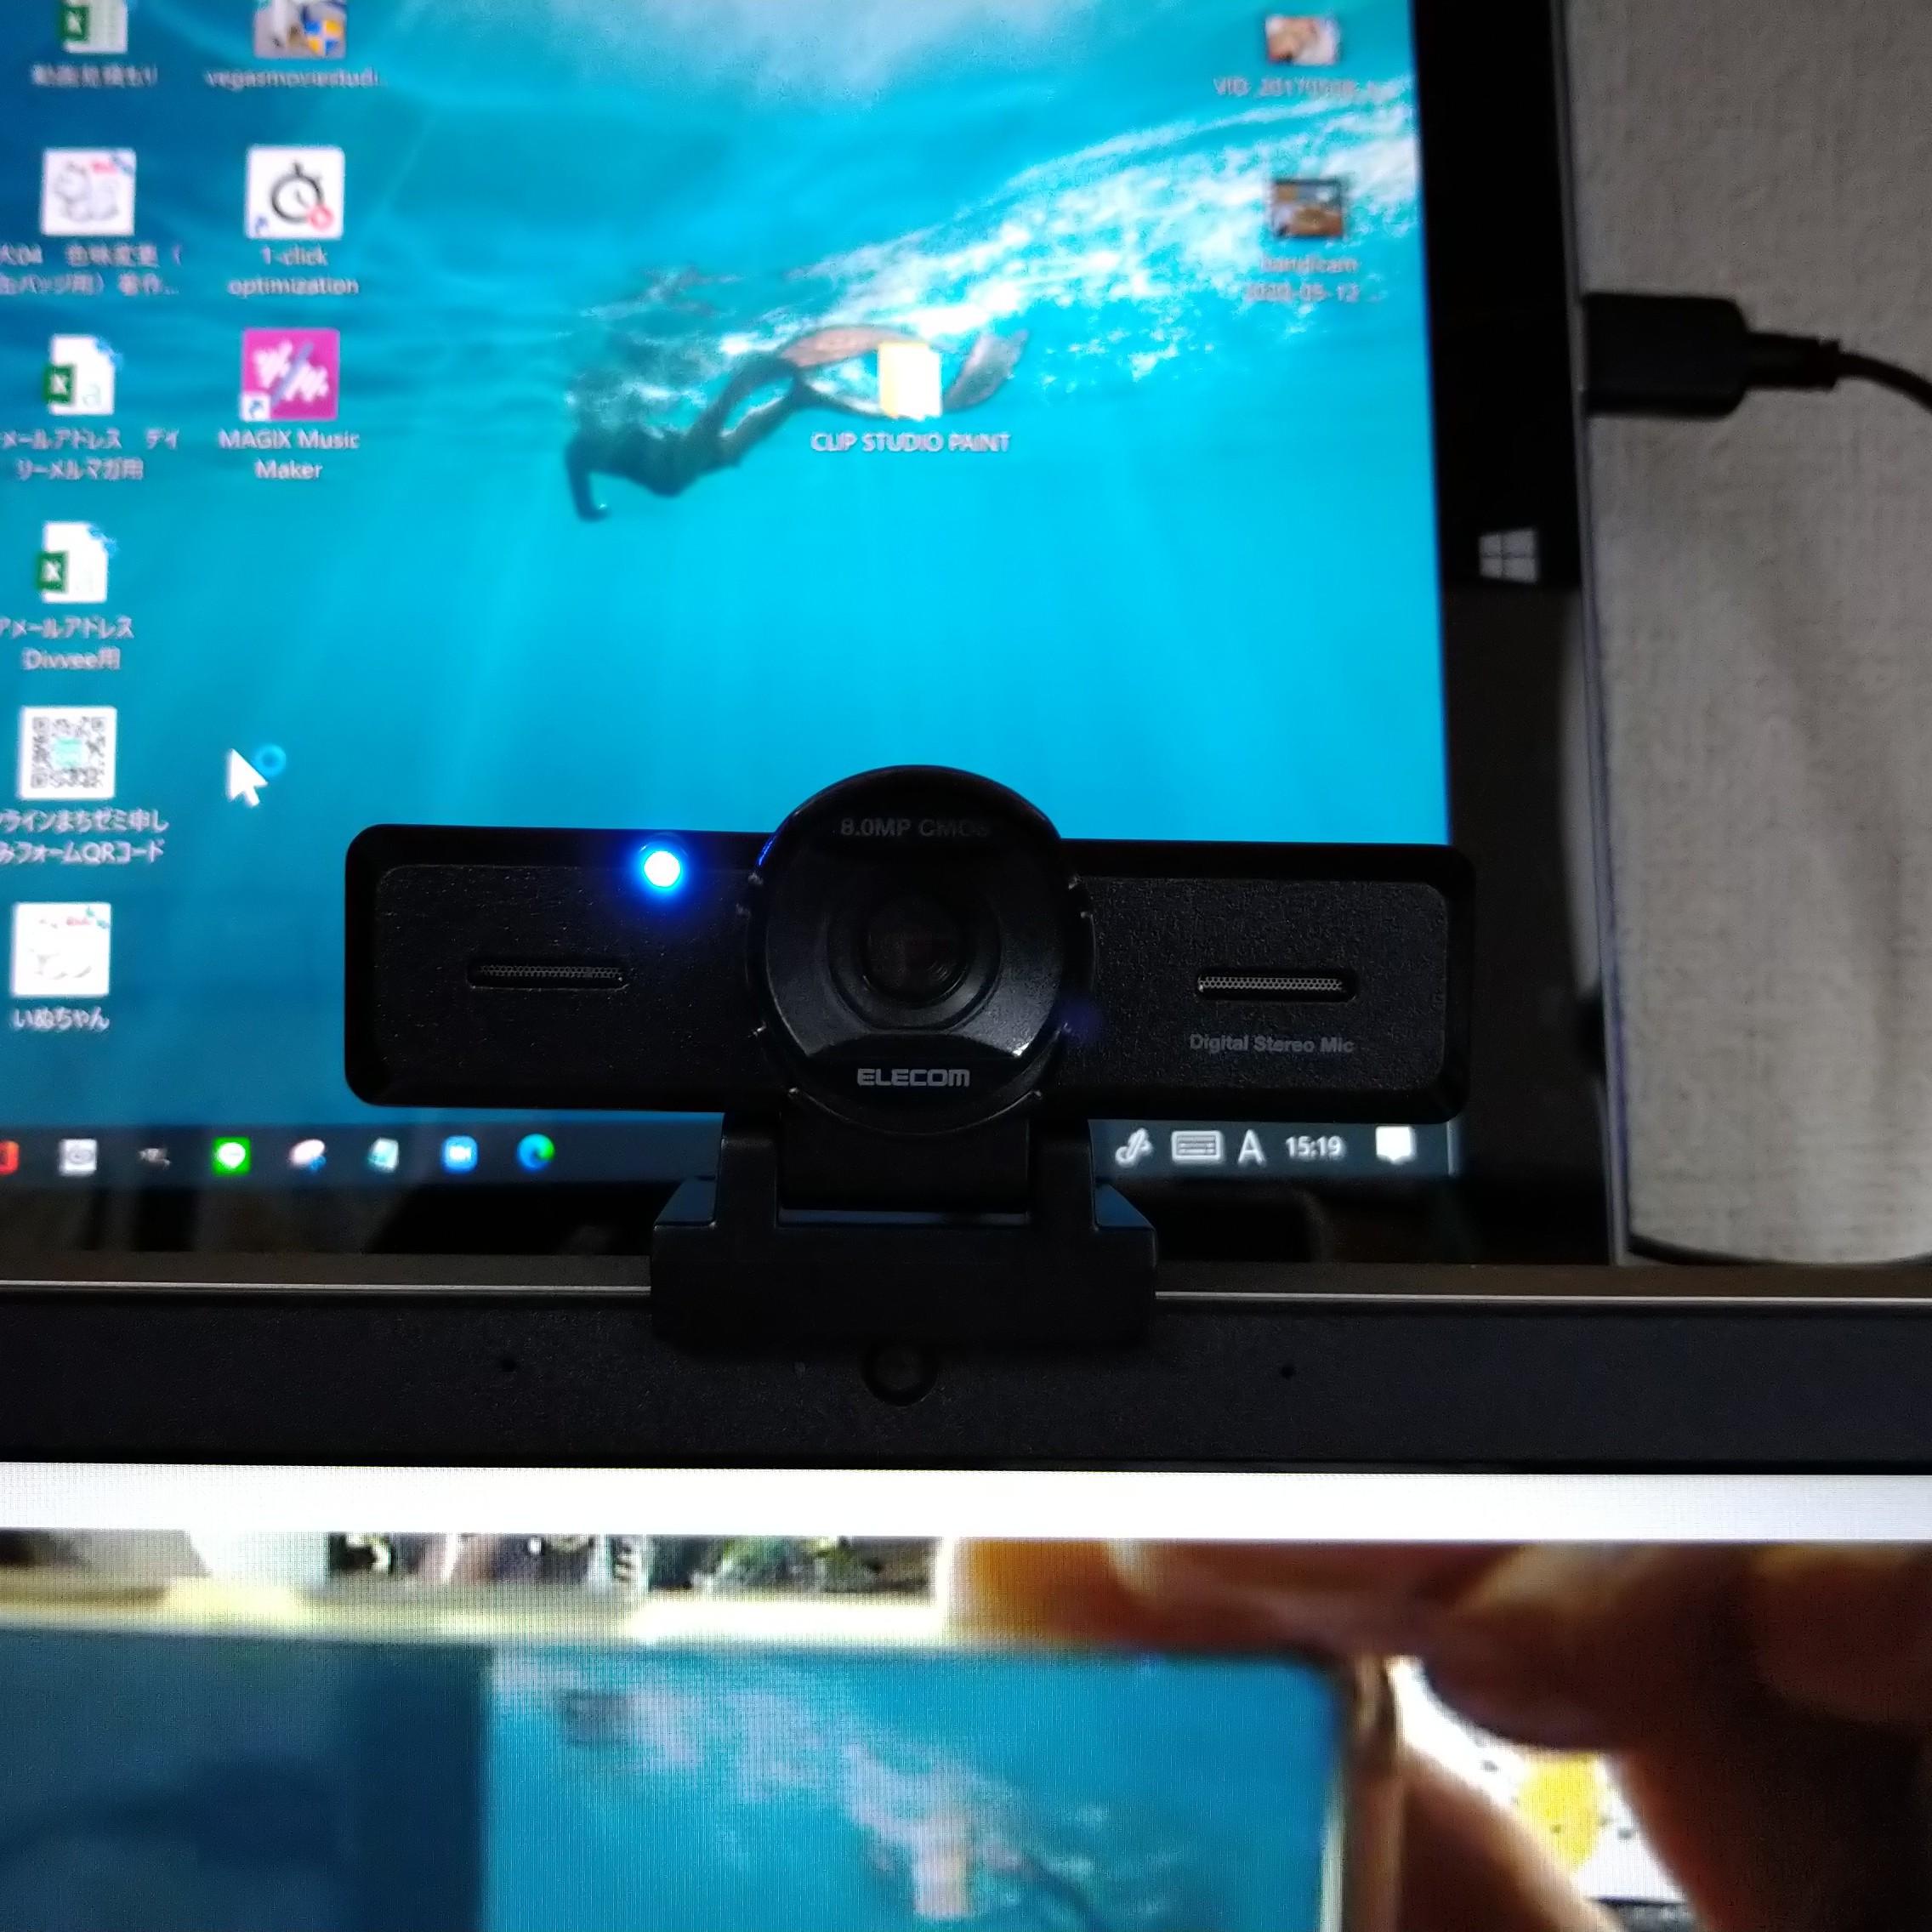 webカメラ,ウェブカメラ,エレコム,UCAM-C980FBBK,Full Hd,800万画素,Webカメラ